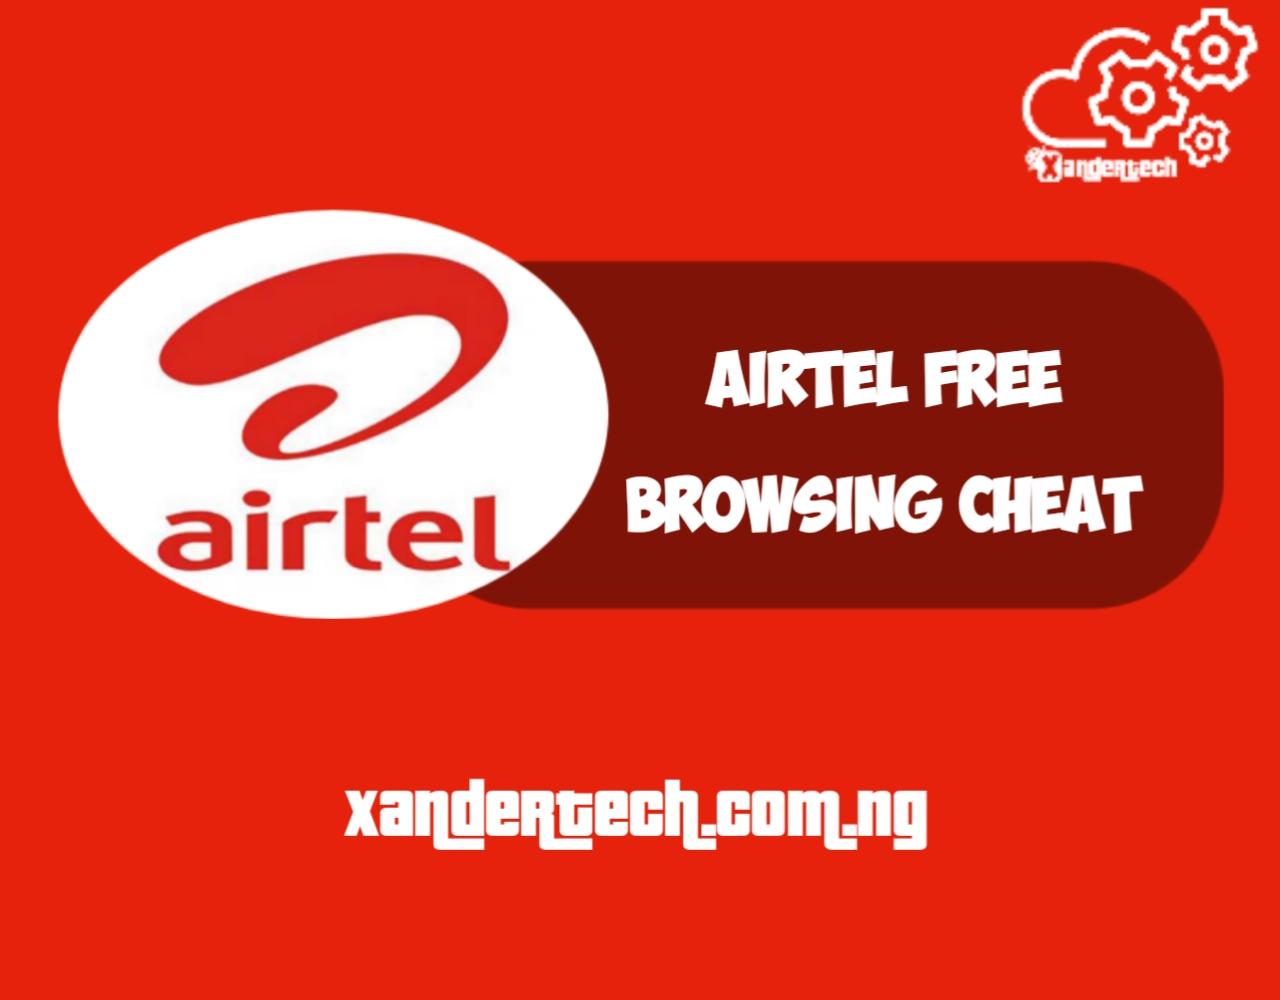 Work Airtel 500MB Cheat with Stark VPN Plus & Ha Tunnel